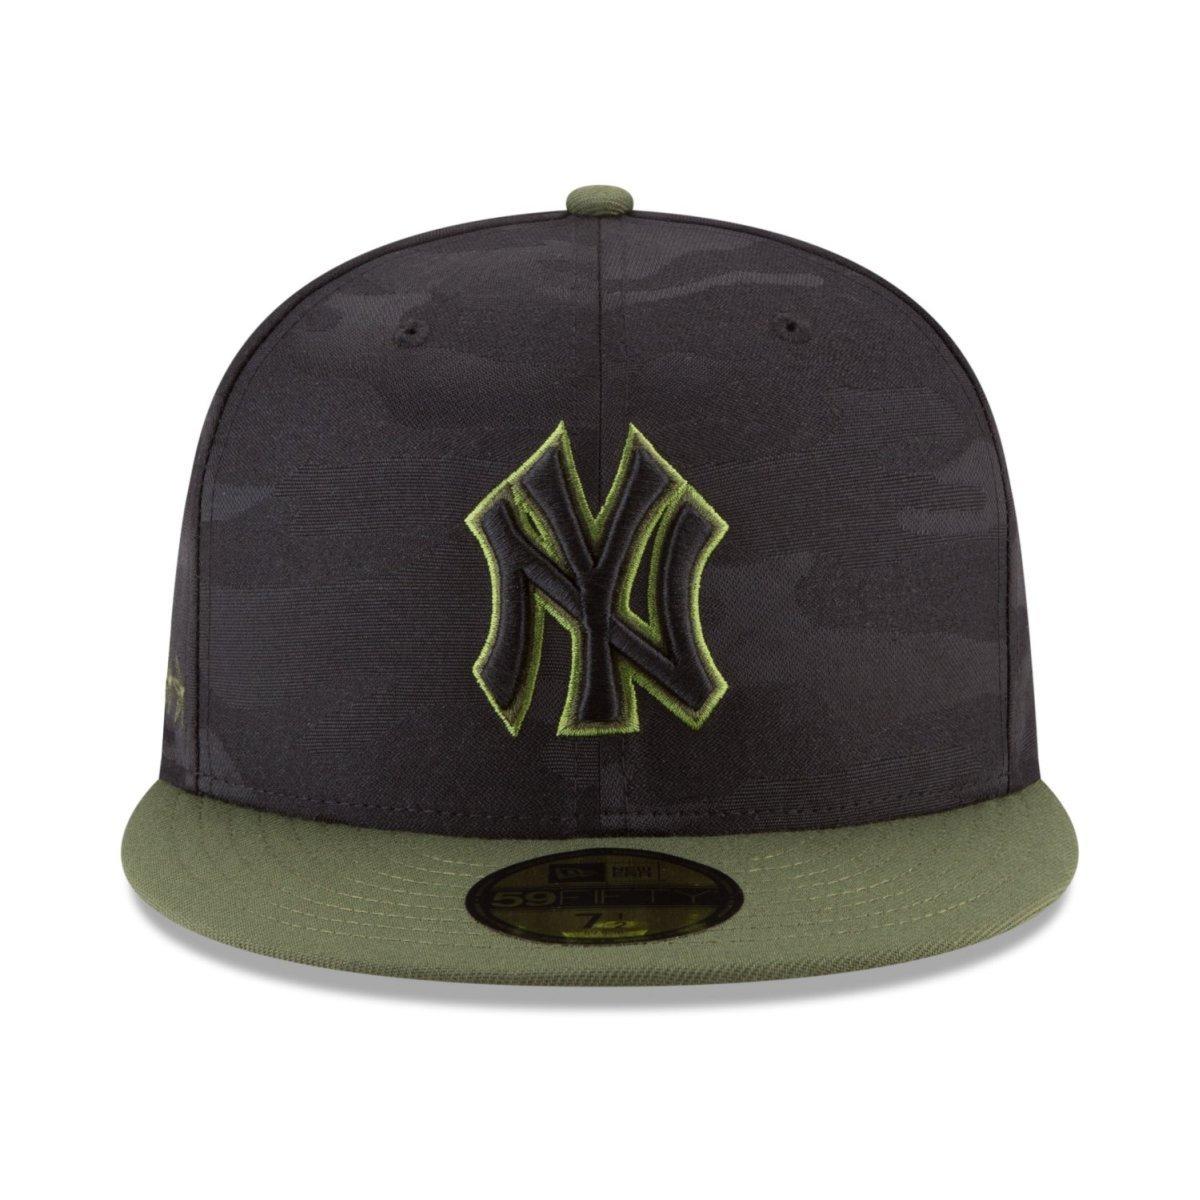 20c8213769560 Gorra New Era 9 Fifty MLB Yankees Memorial Day Camu Negro - Negro - 7 1 8   Amazon.com.mx  Ropa